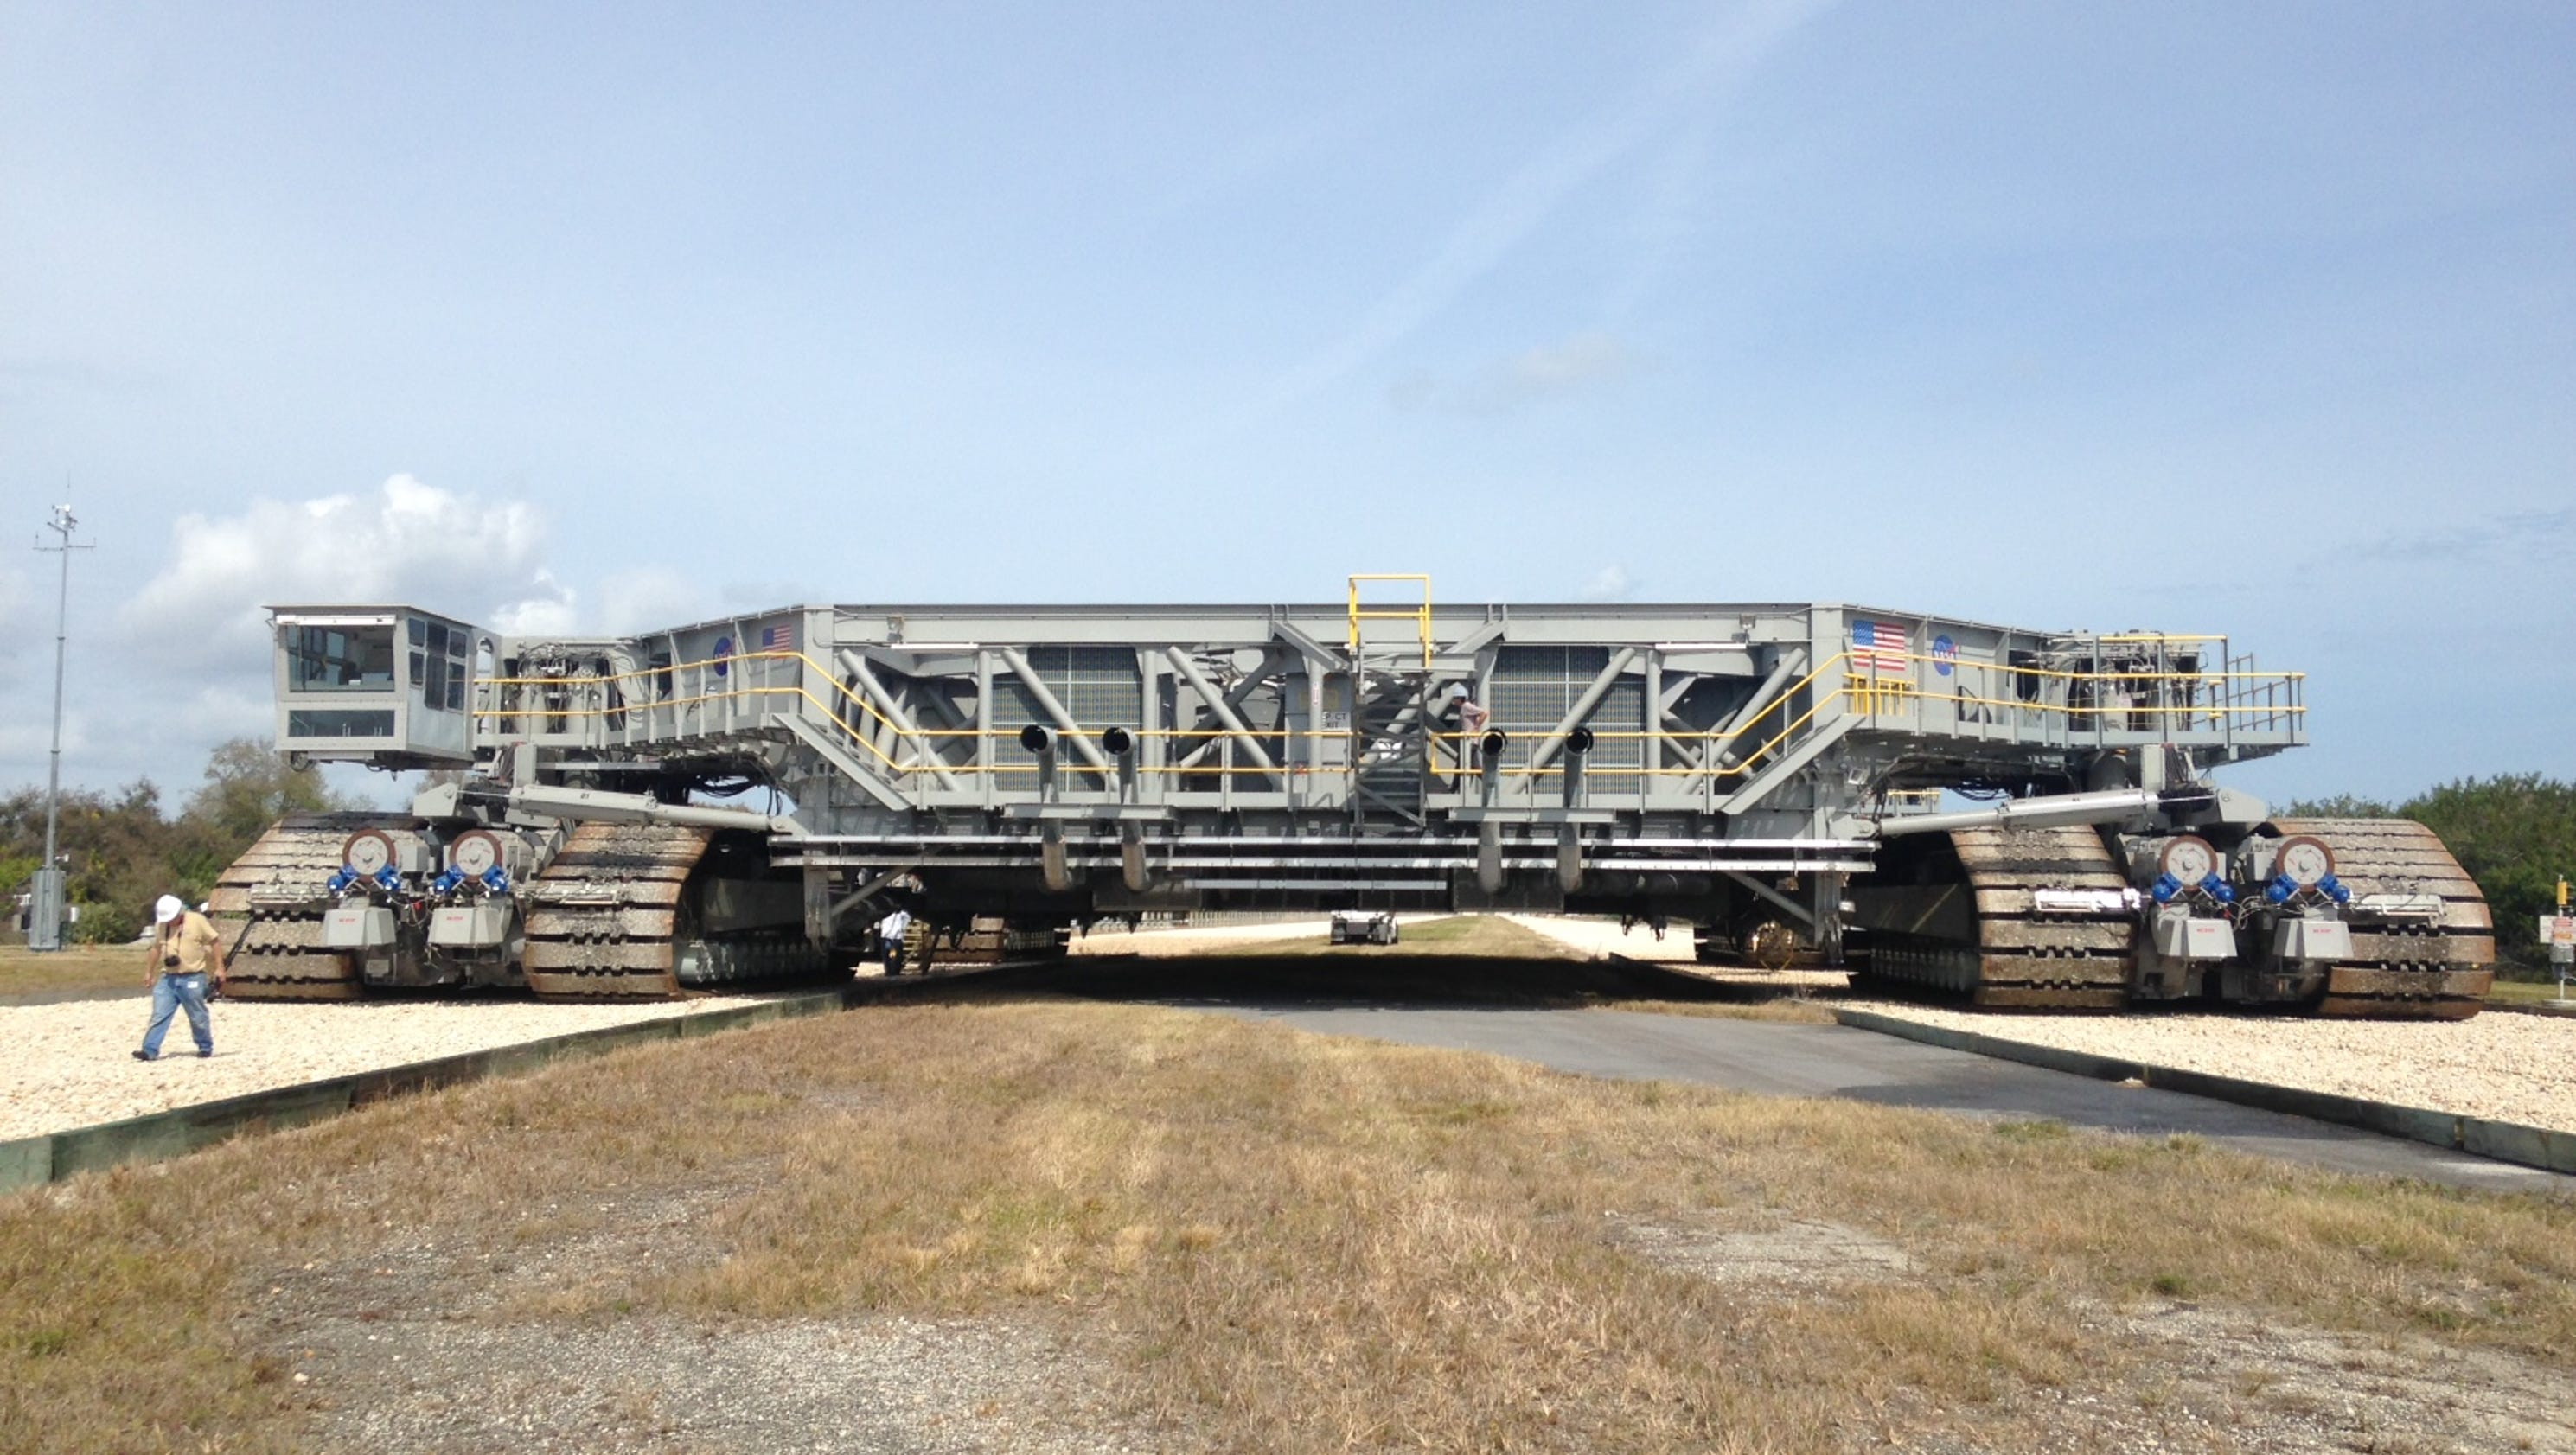 nasa tests upgraded crawlertransporter at ksc